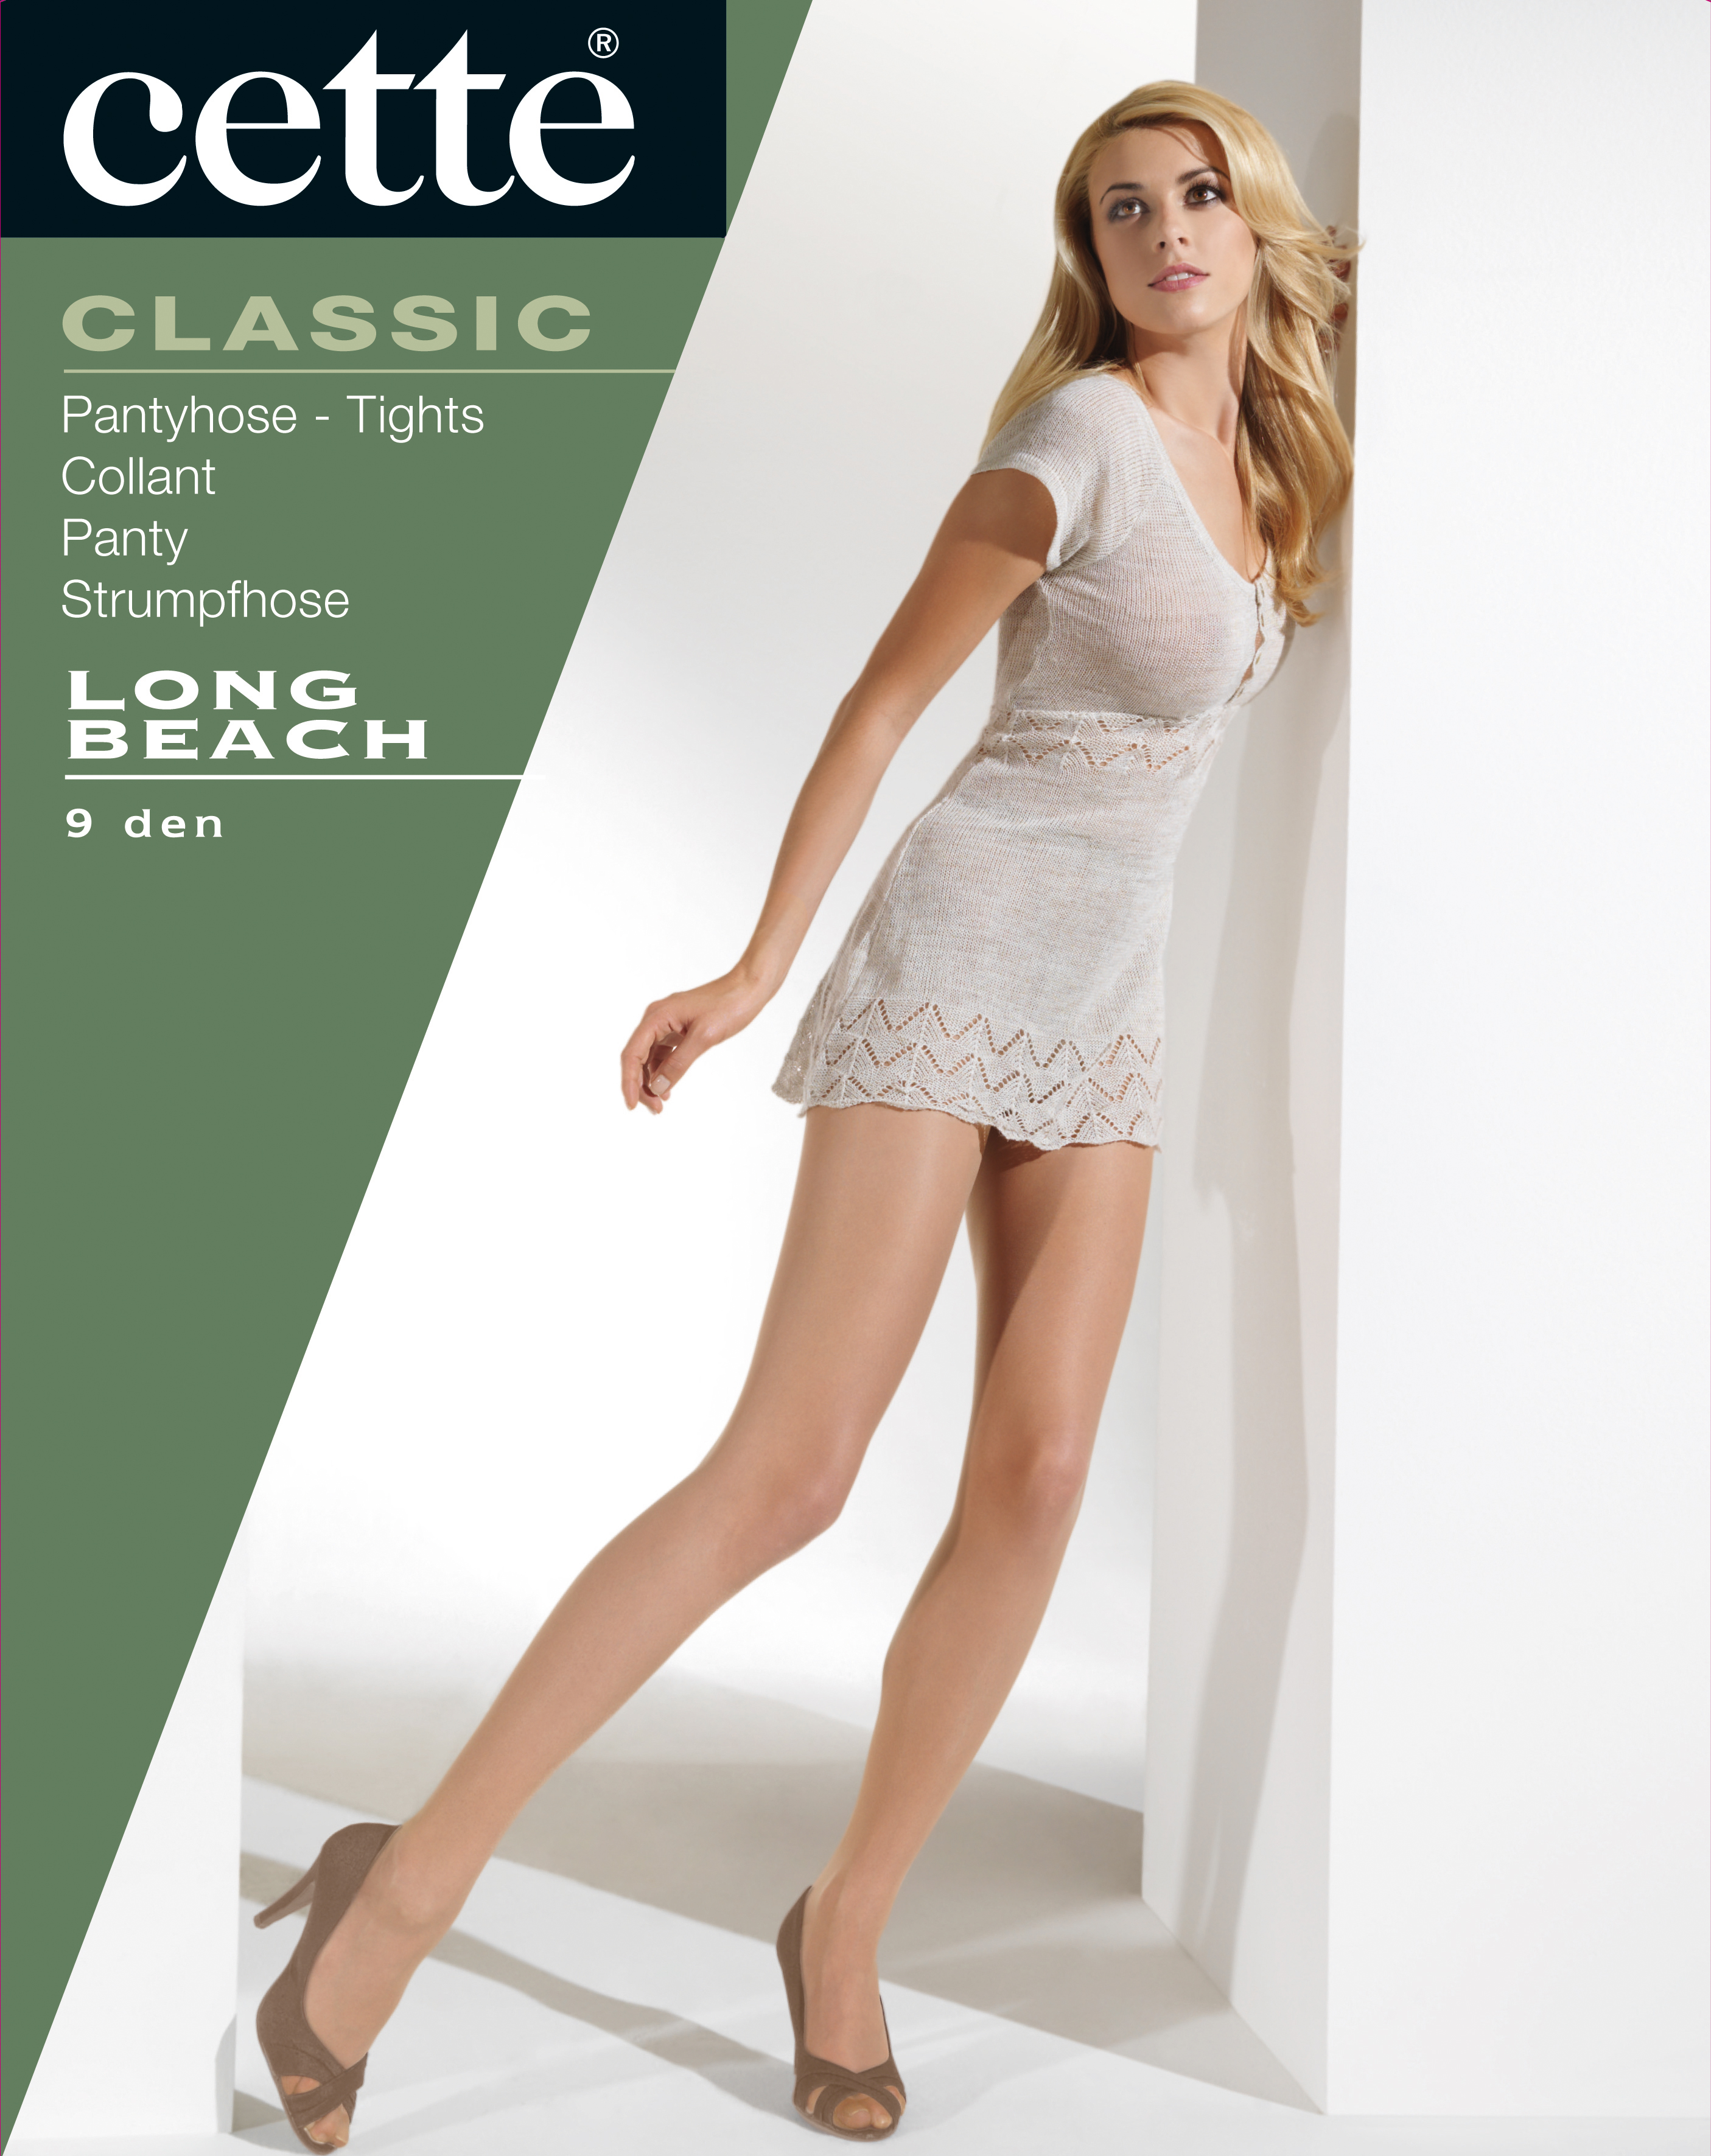 239453013b27a Cette Long Beach - Ultra sheer summer tights |escapeHtml} ✅